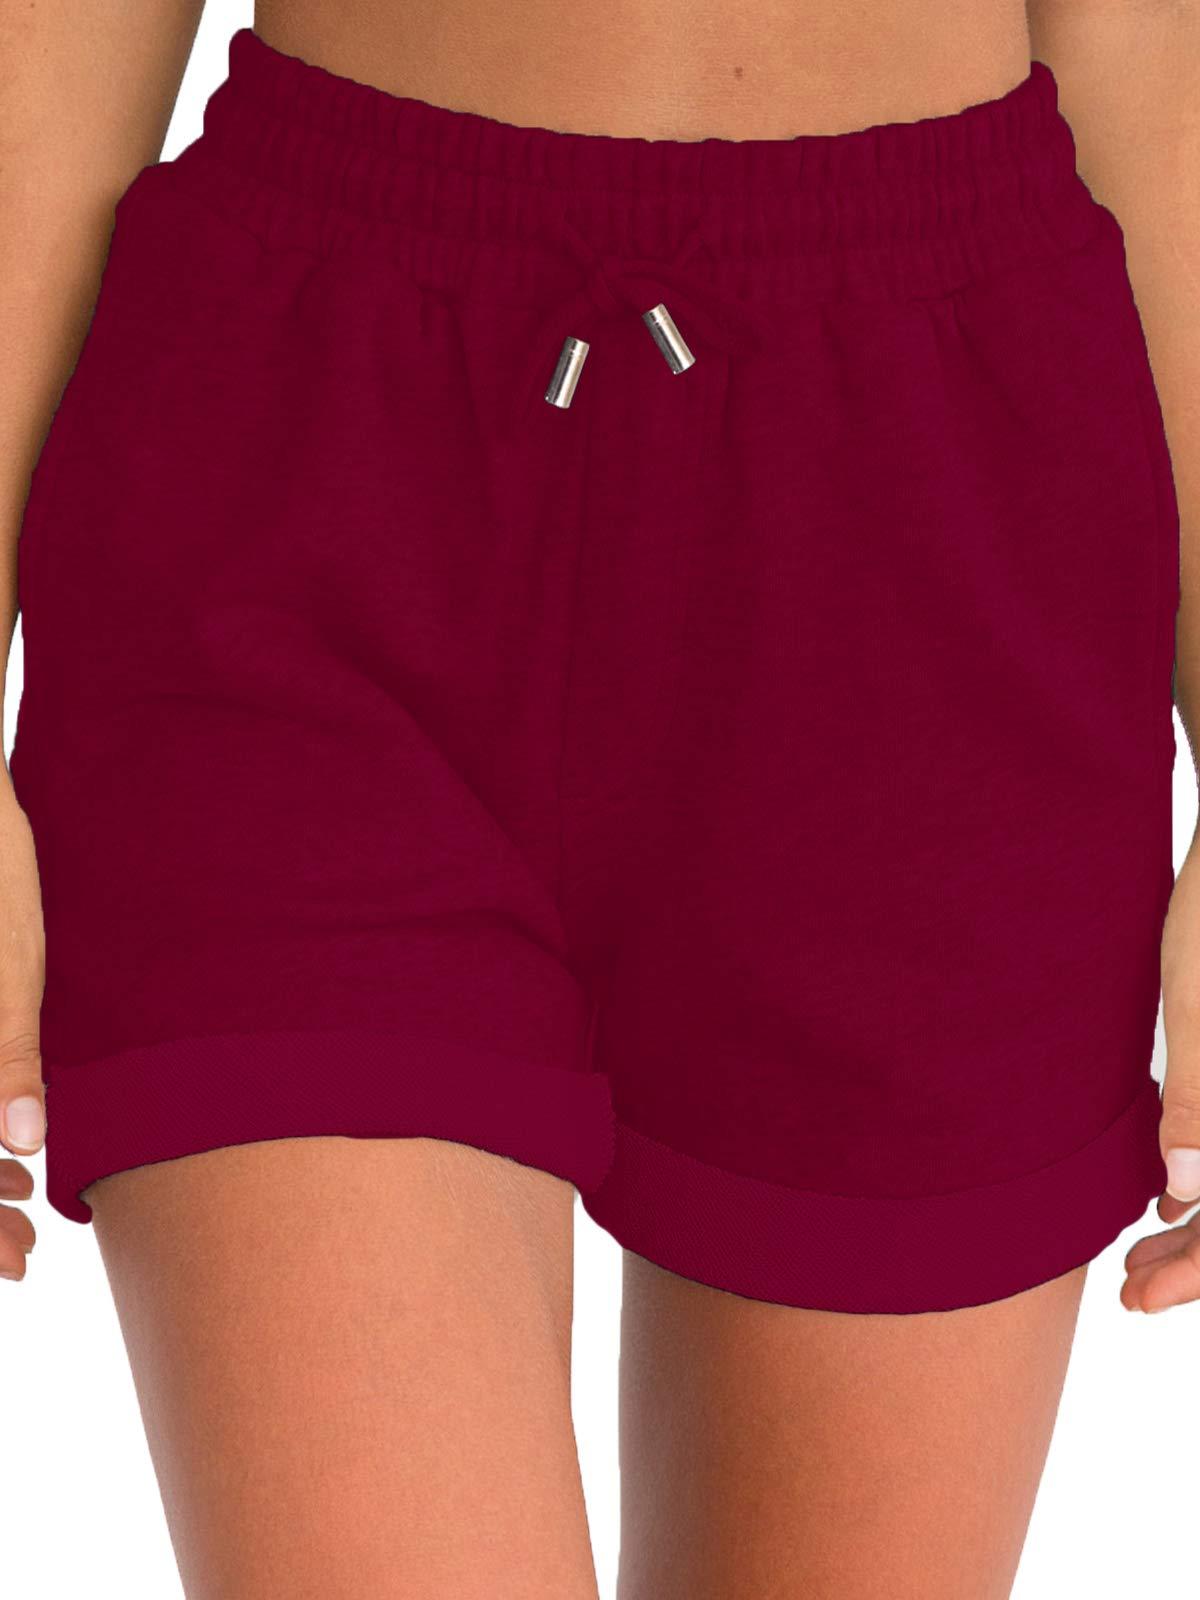 Govc Women's Juniors Shorts Casual Summer Elastic Waist Beach Shorts with Drawstring(Burgundy,S) by Govc (Image #3)